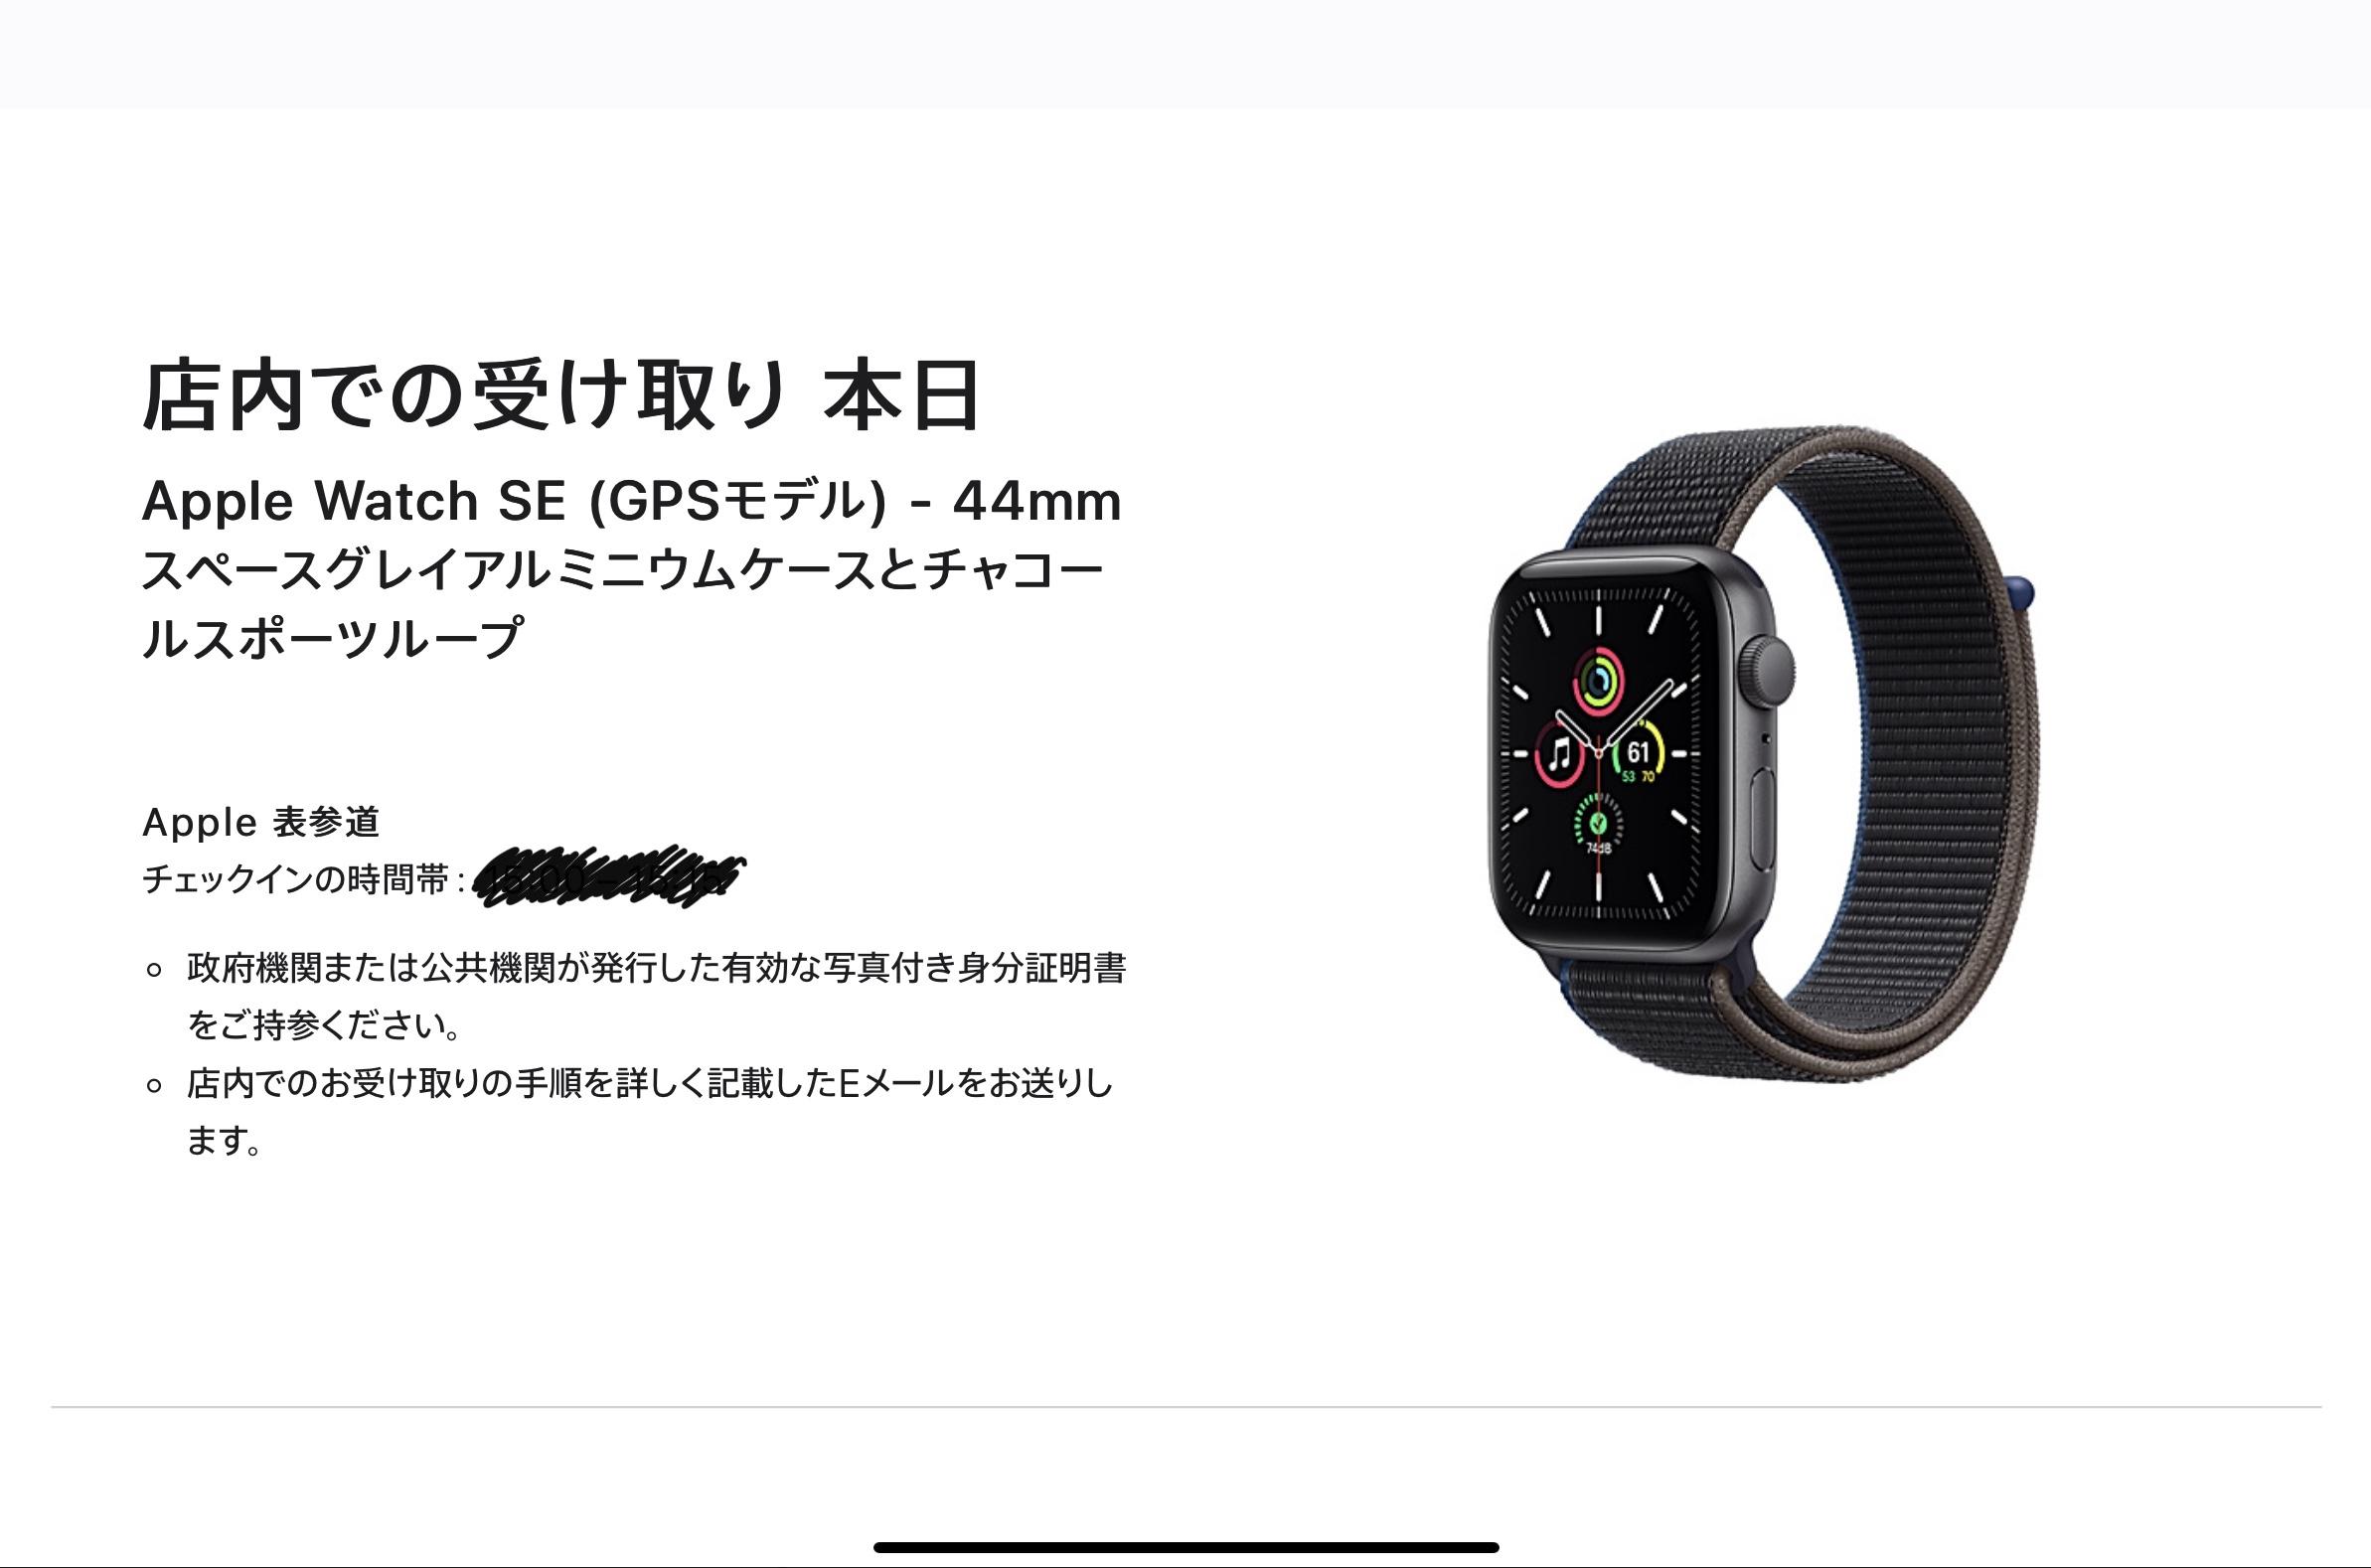 Apple WatchSE受け取り画面